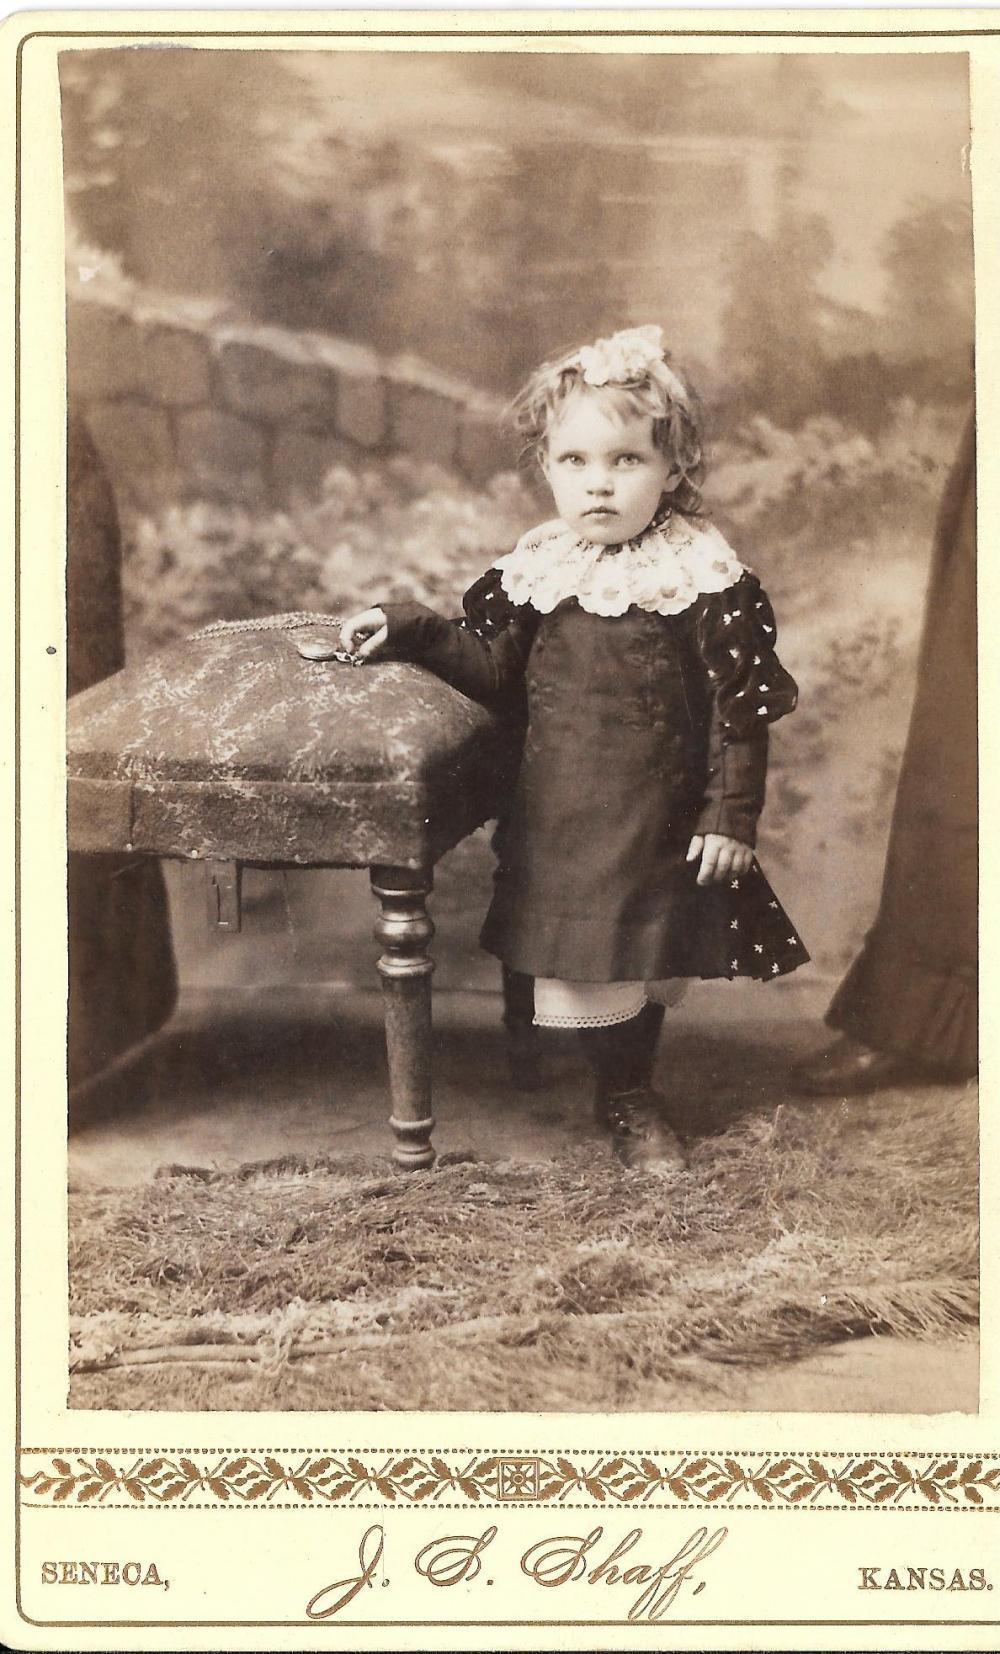 One-legged girl cabinet card, 1870s